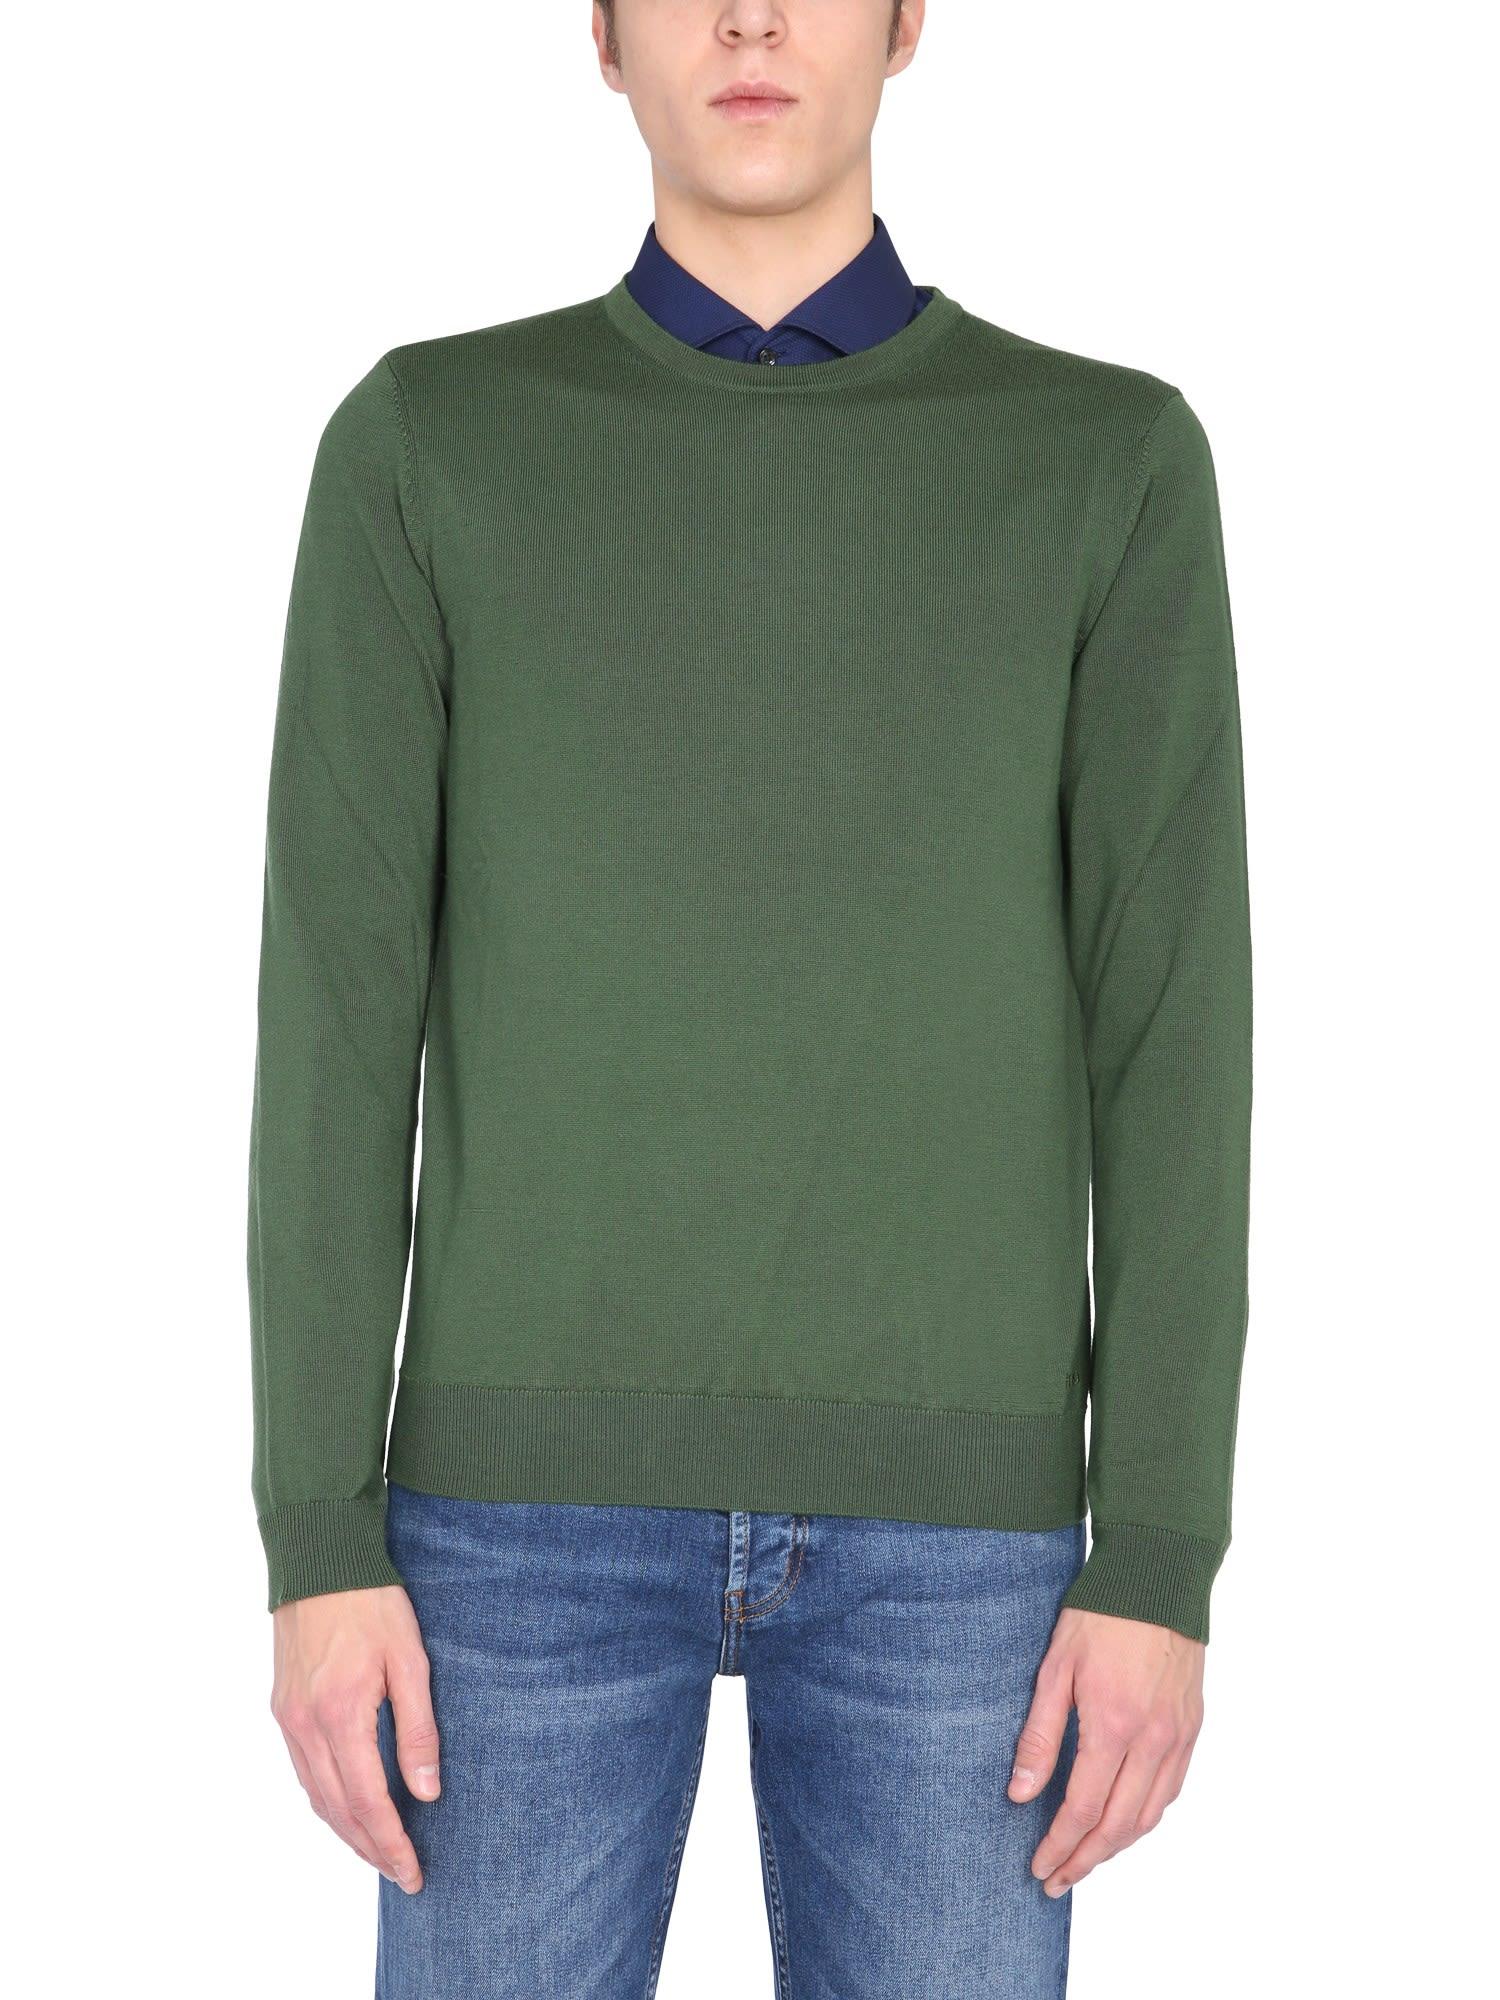 Hugo Boss Sweaters SAN PAOLO SWEATER